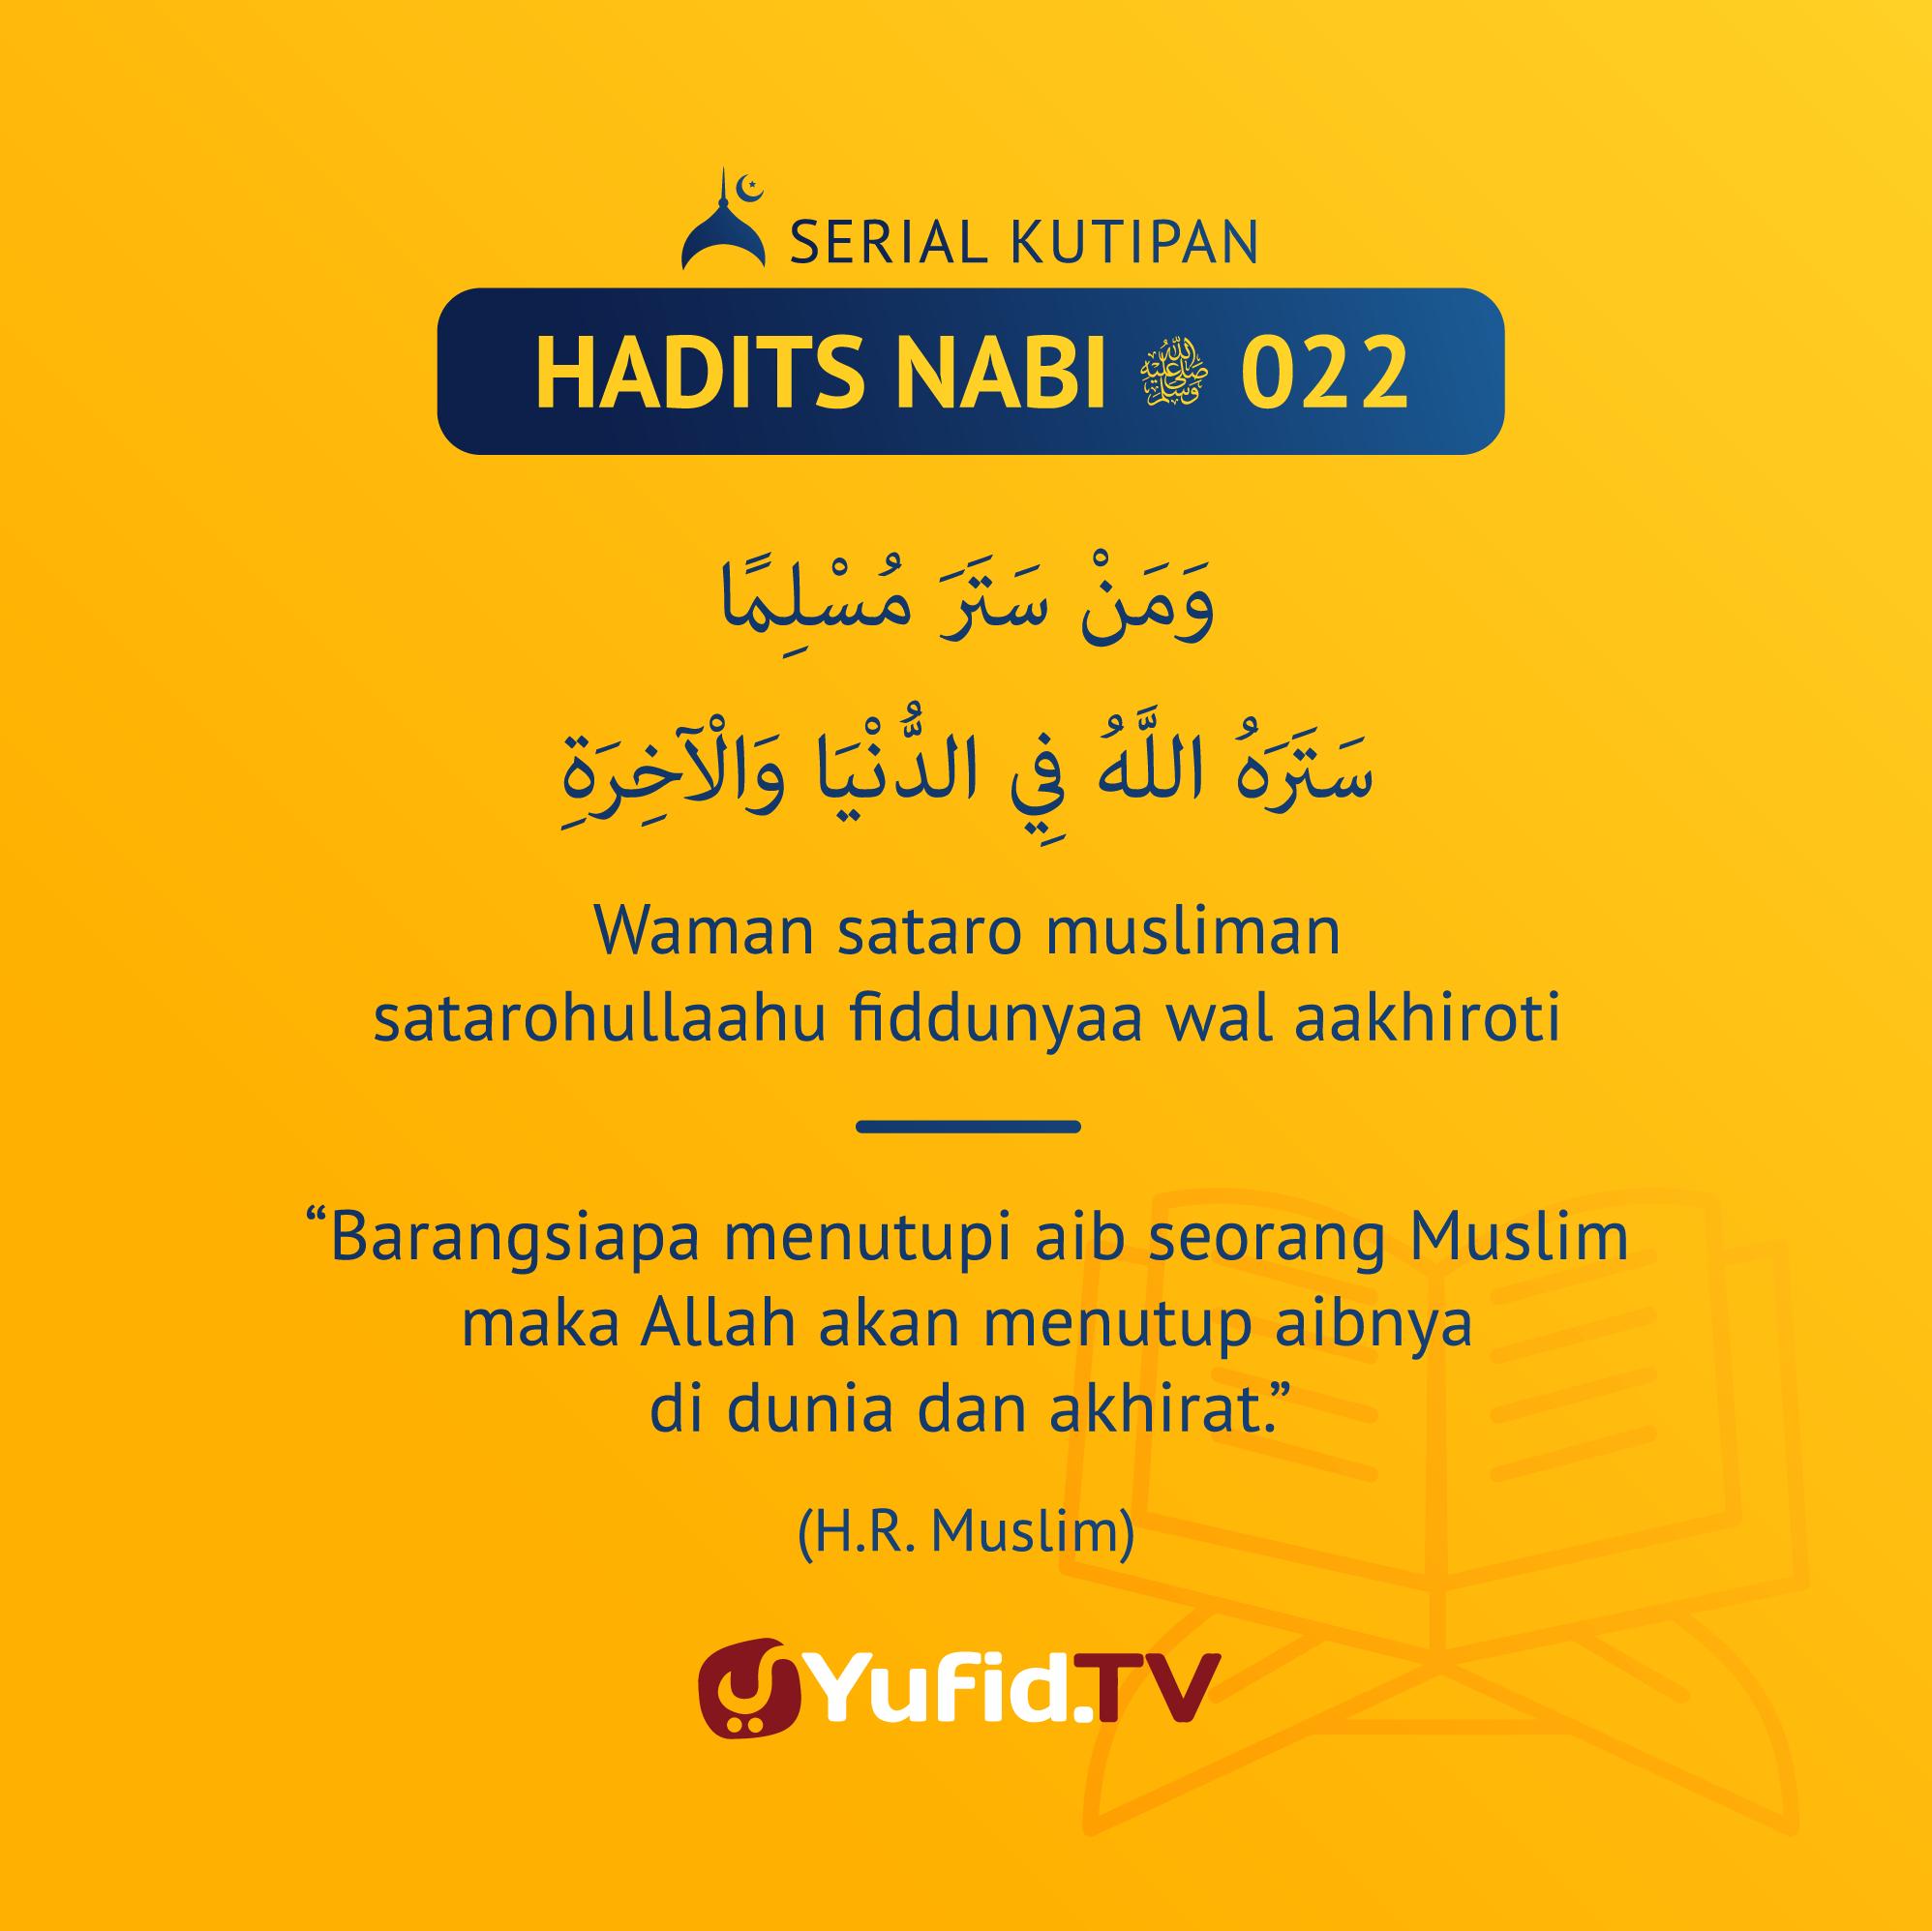 Serial Kutipan Hadits: Menutup Aib Muslim